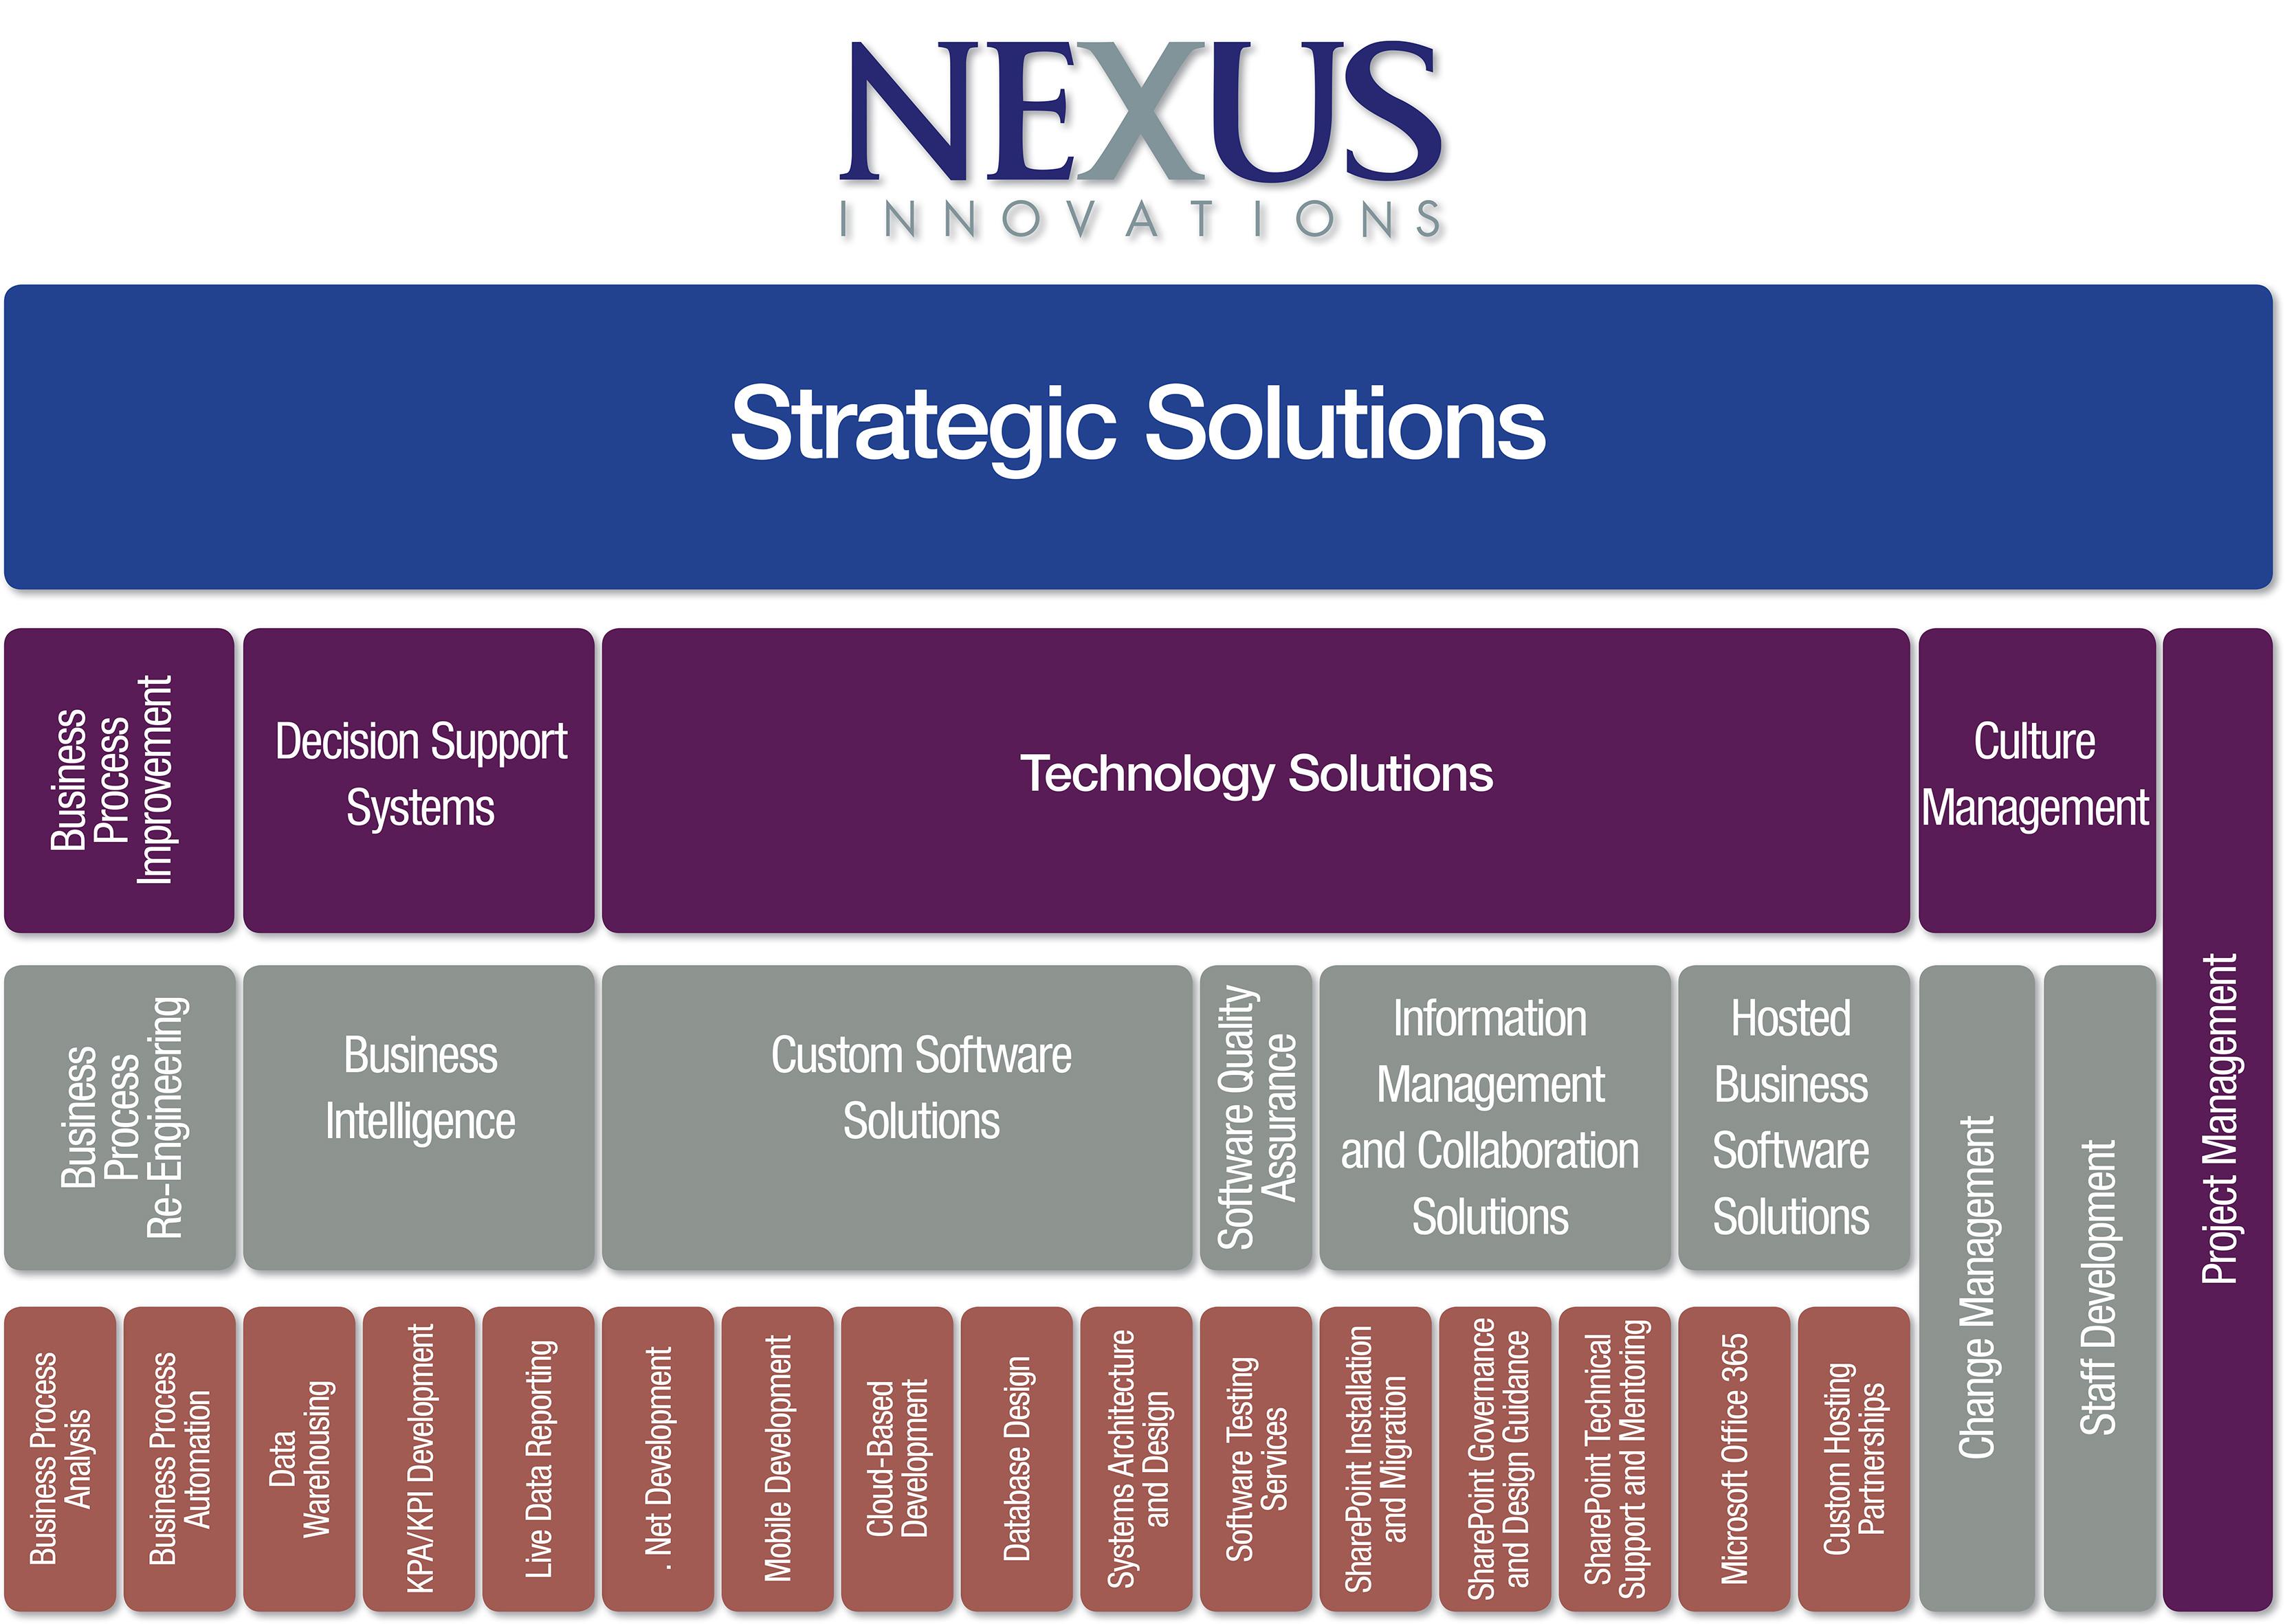 nexus_vision_poster_v2